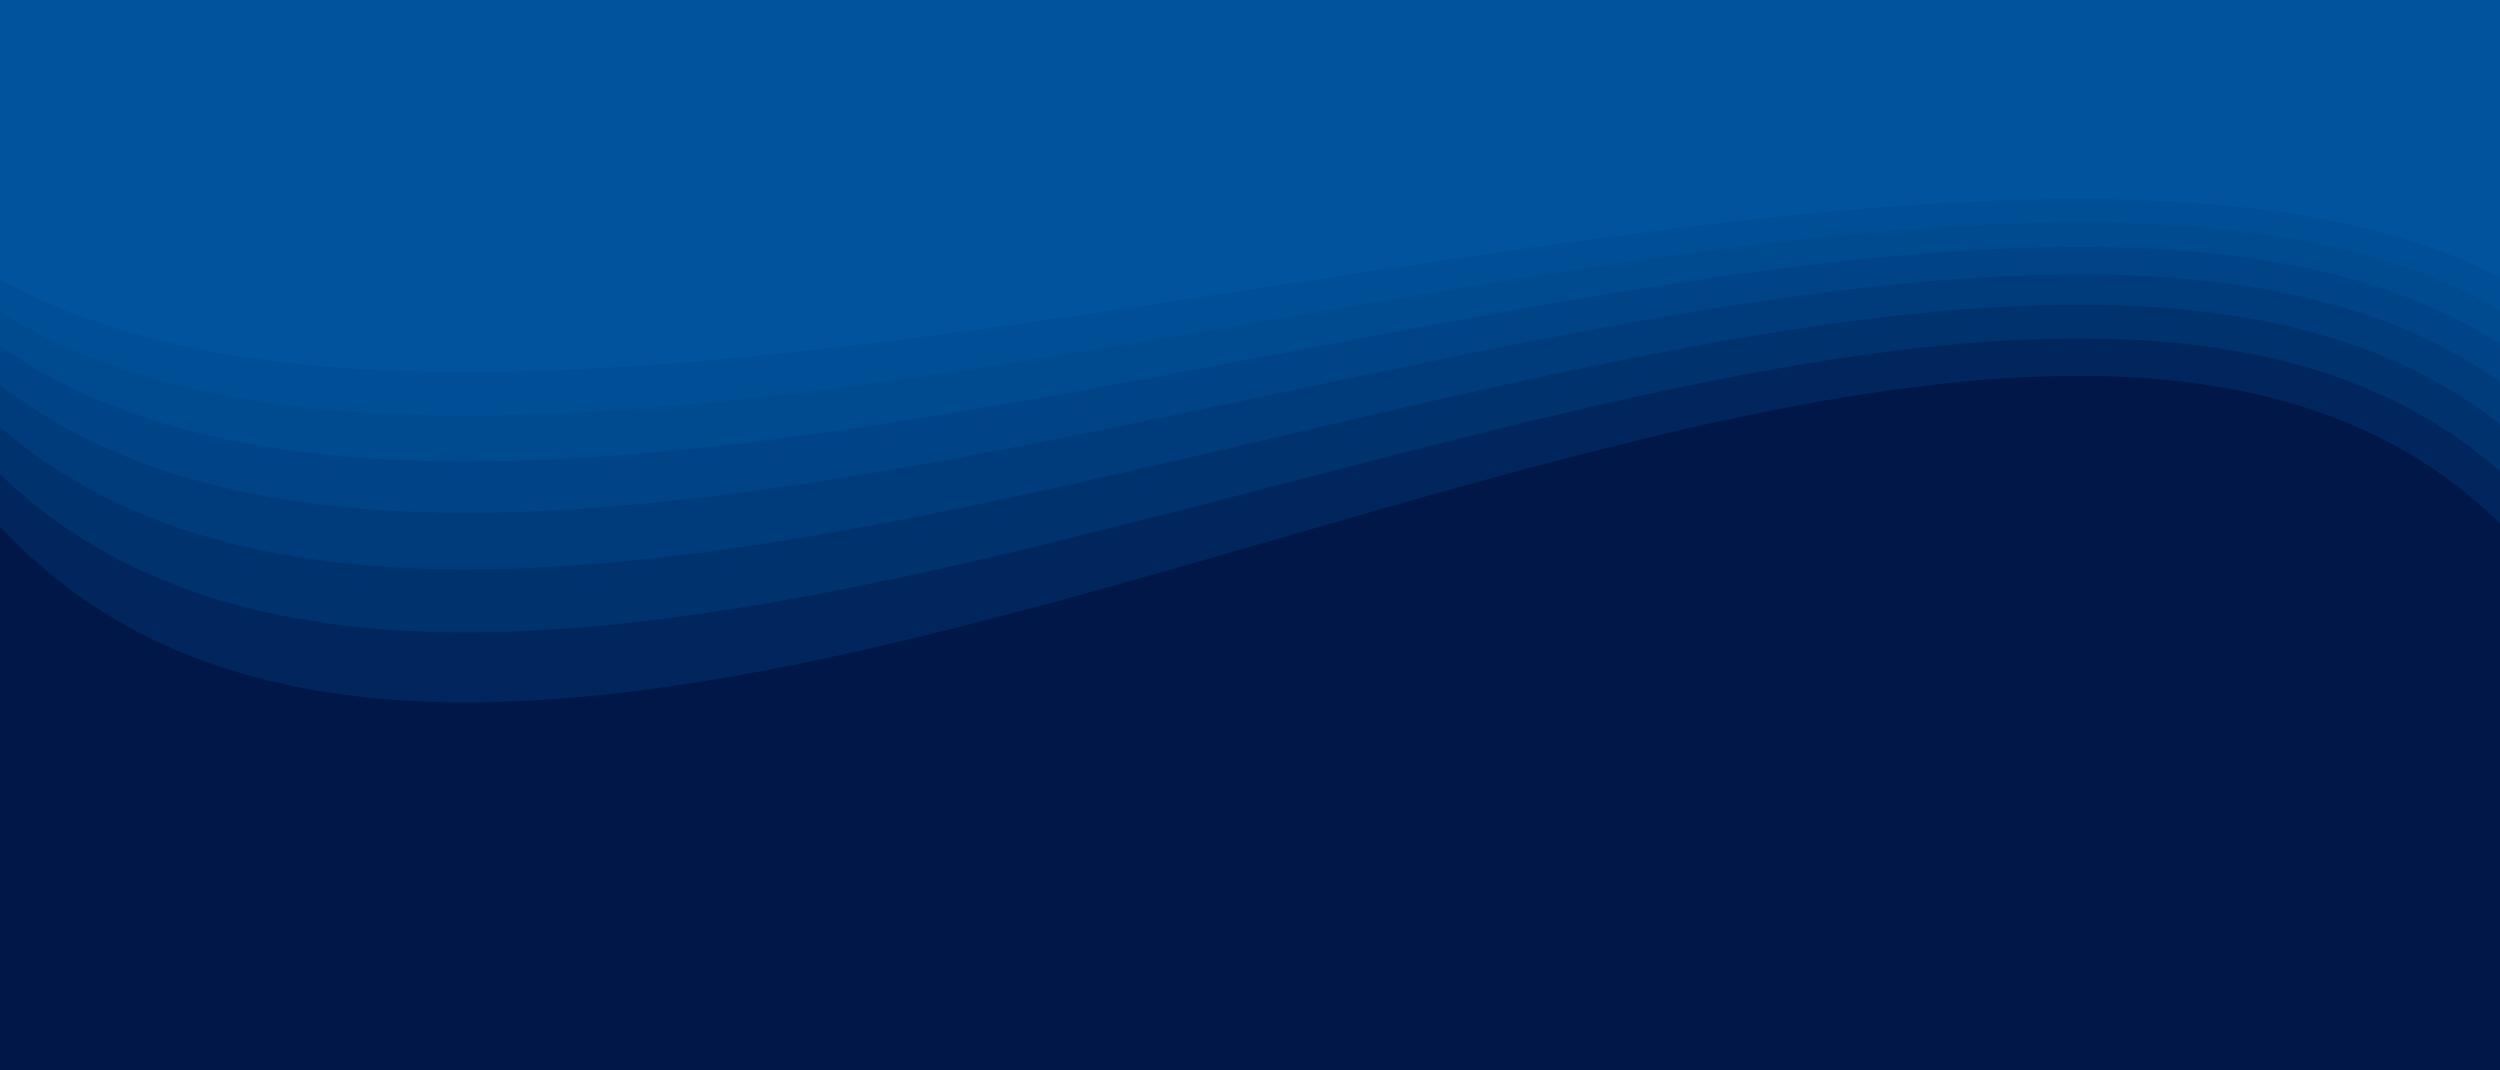 Wave x free clip. Waves clipart dark blue